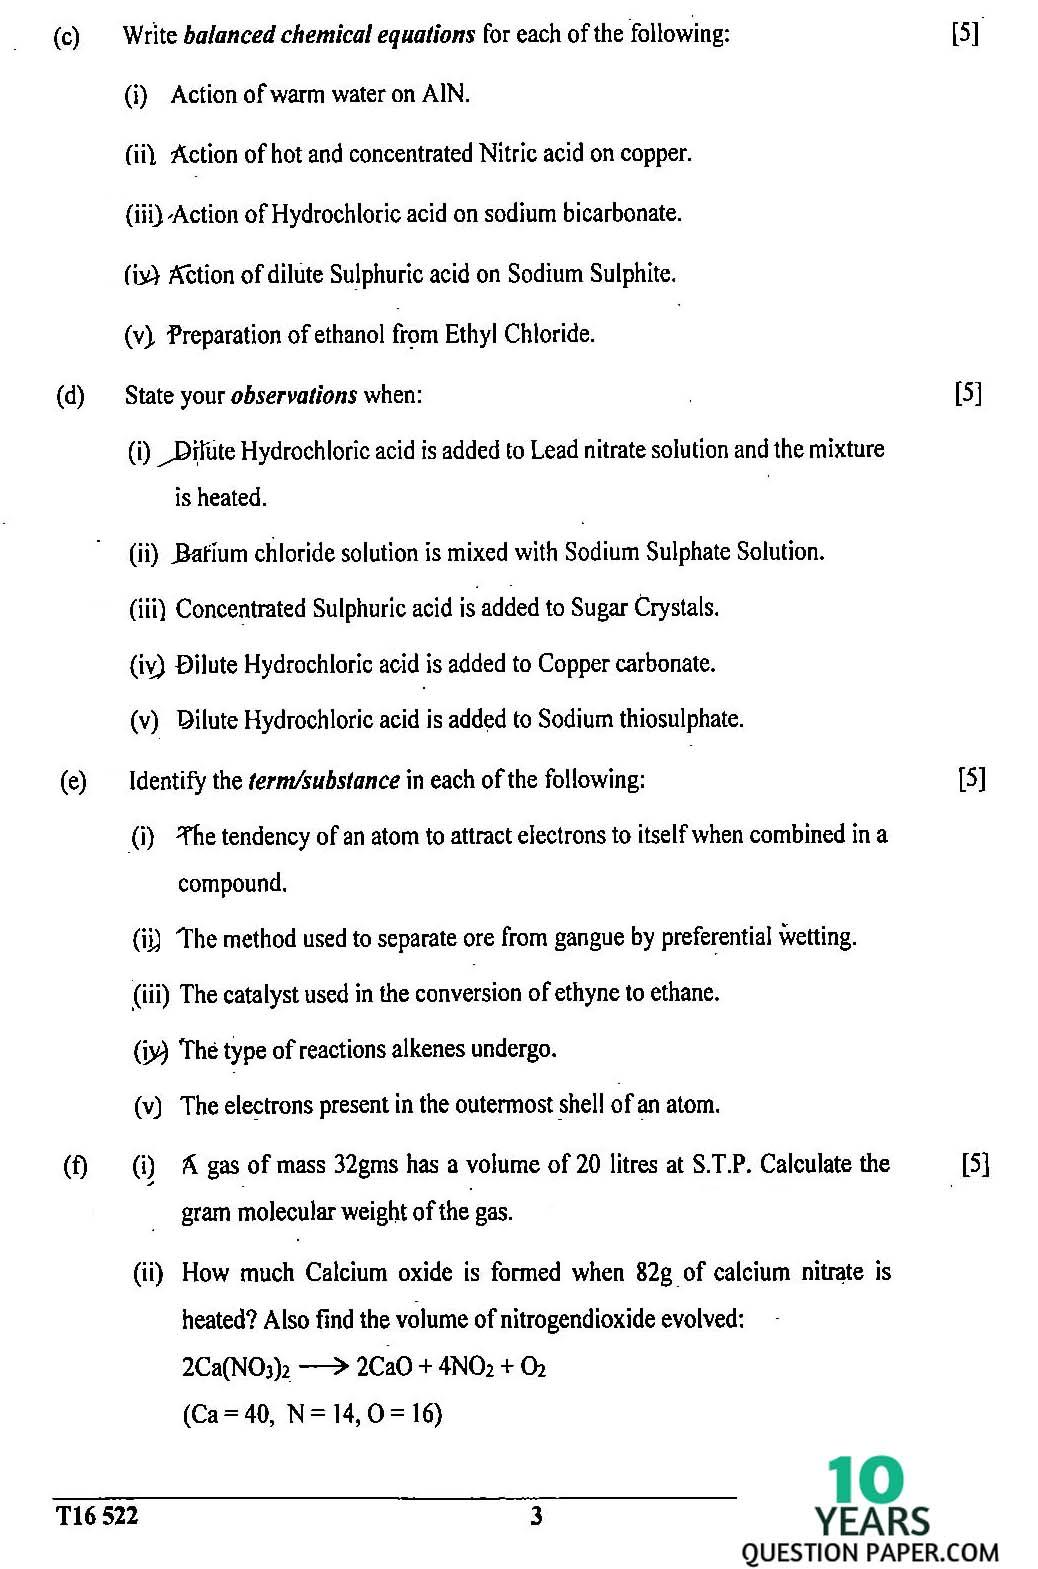 ICSE Class 10 Chemistry 2016 Question Paper